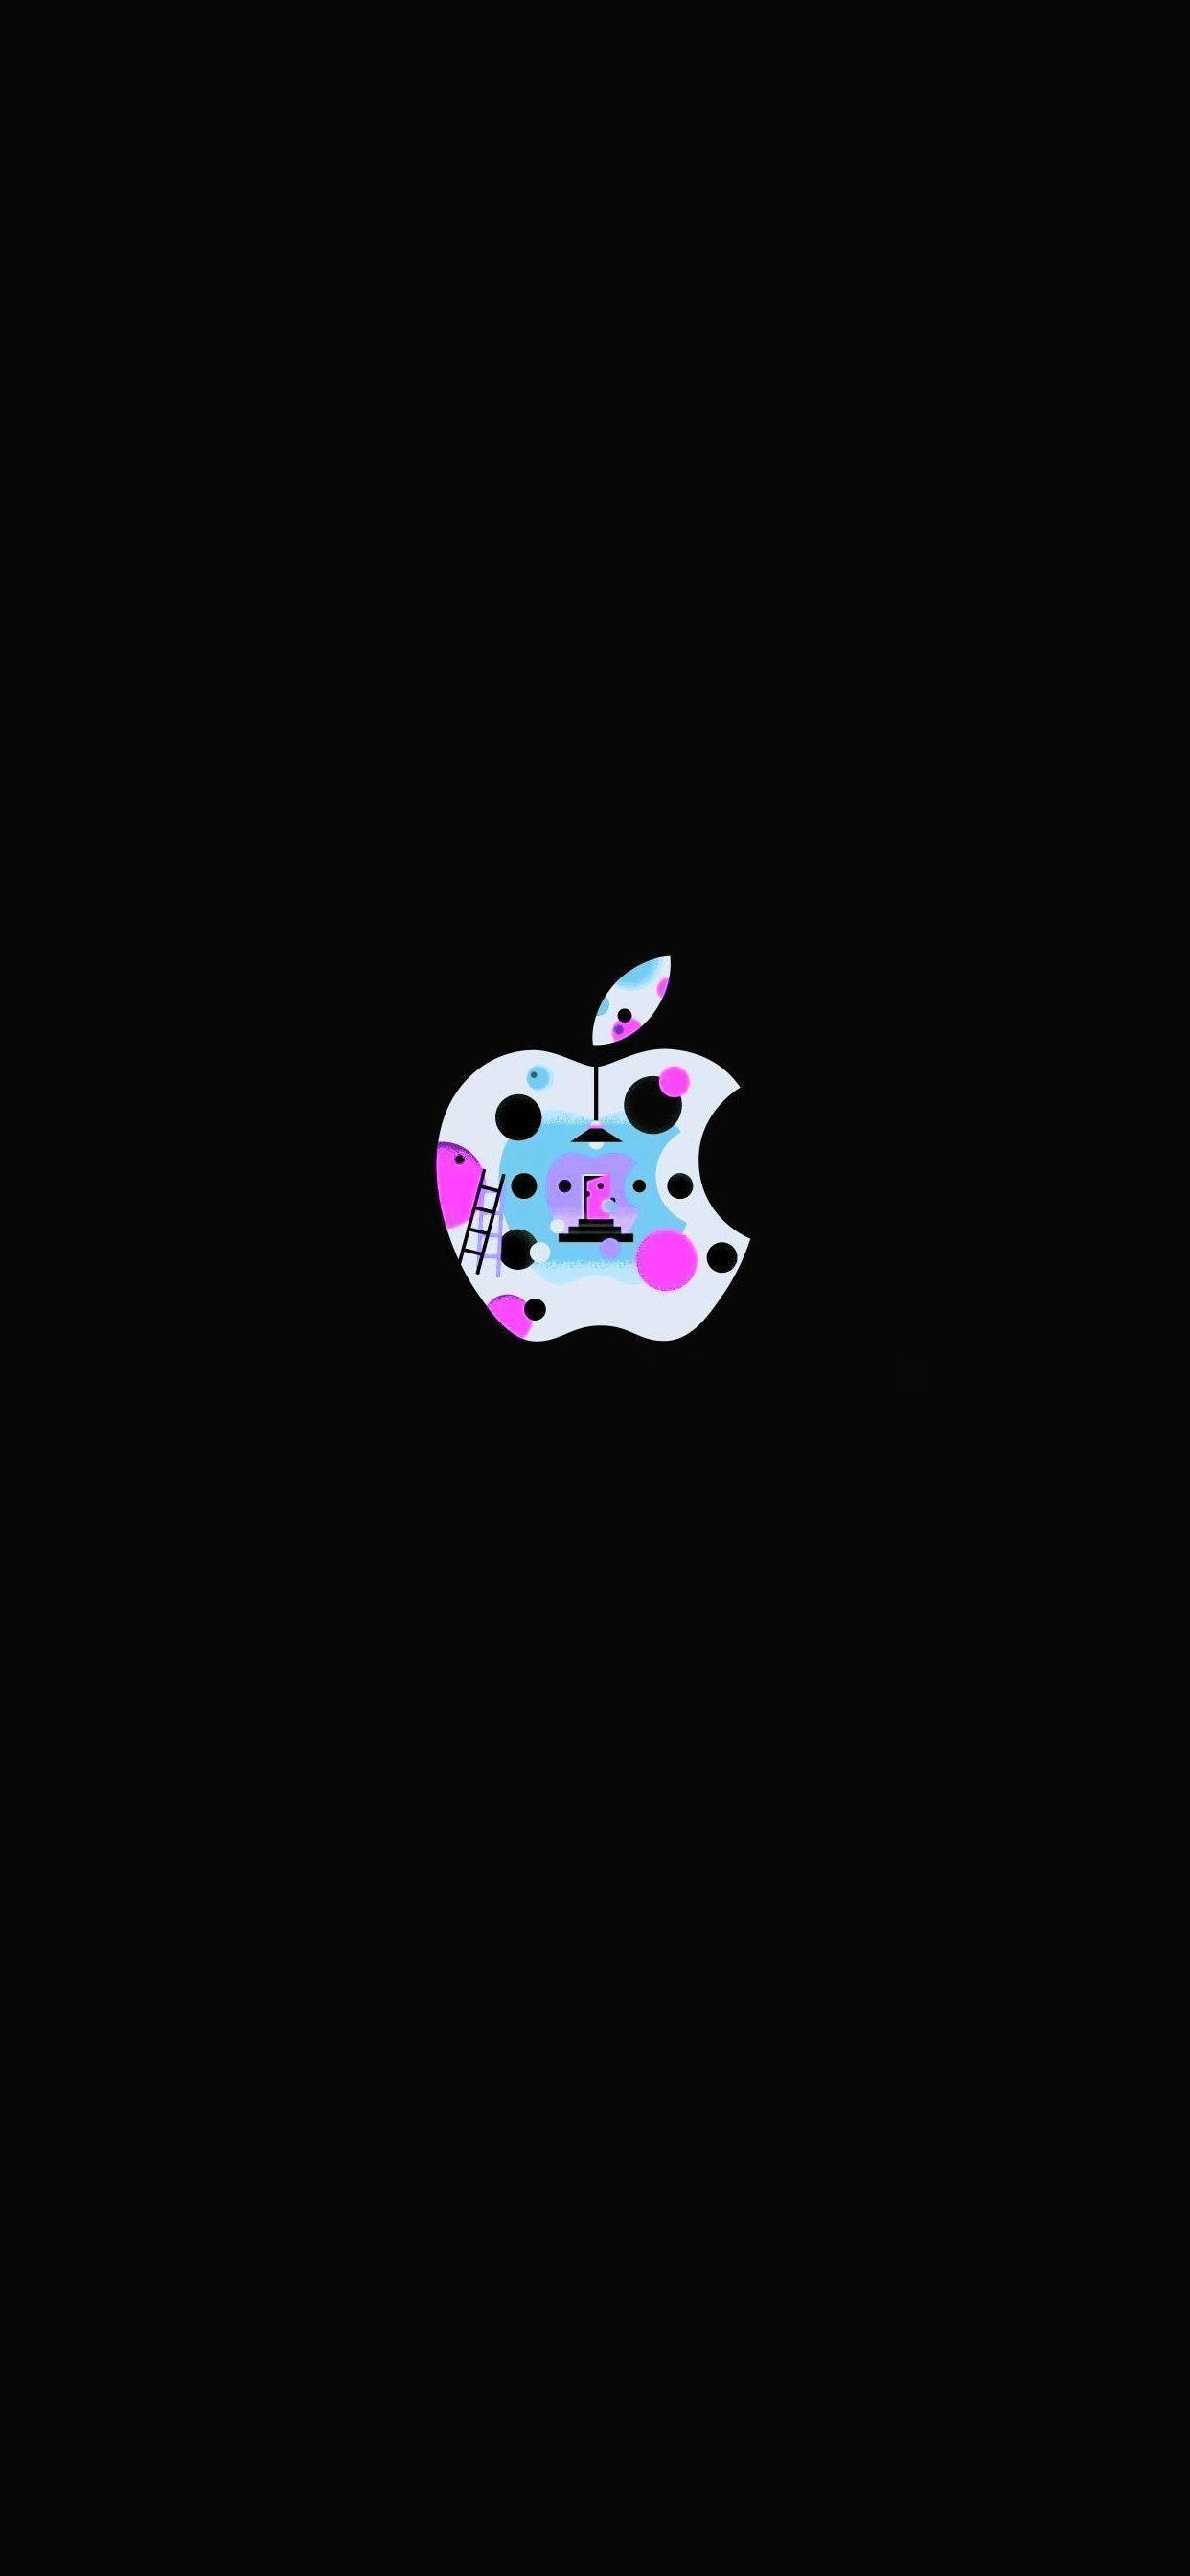 ios 13 wallpaper #ios13wallpaper #iOS13 #iphonewallpaper #apple #logo #colorful #darkmode #ios13wallpaper #iOS13 #iphonewallpaper #apple #logo #colorful #darkmode #ios13wallpaper #iOS13 #iphonewallpaper #apple #logo #colorful #darkmode #ios13wallpaper #iOS13 #iphonewallpaper #apple #logo #colorful #darkmode #ios13wallpaper #iOS13 #iphonewallpaper #apple #logo #colorful #darkmode #ios13wallpaper #iOS13 #iphonewallpaper #apple #logo #colorful #darkmode #ios13wallpaper #iOS13 #iphonewallp